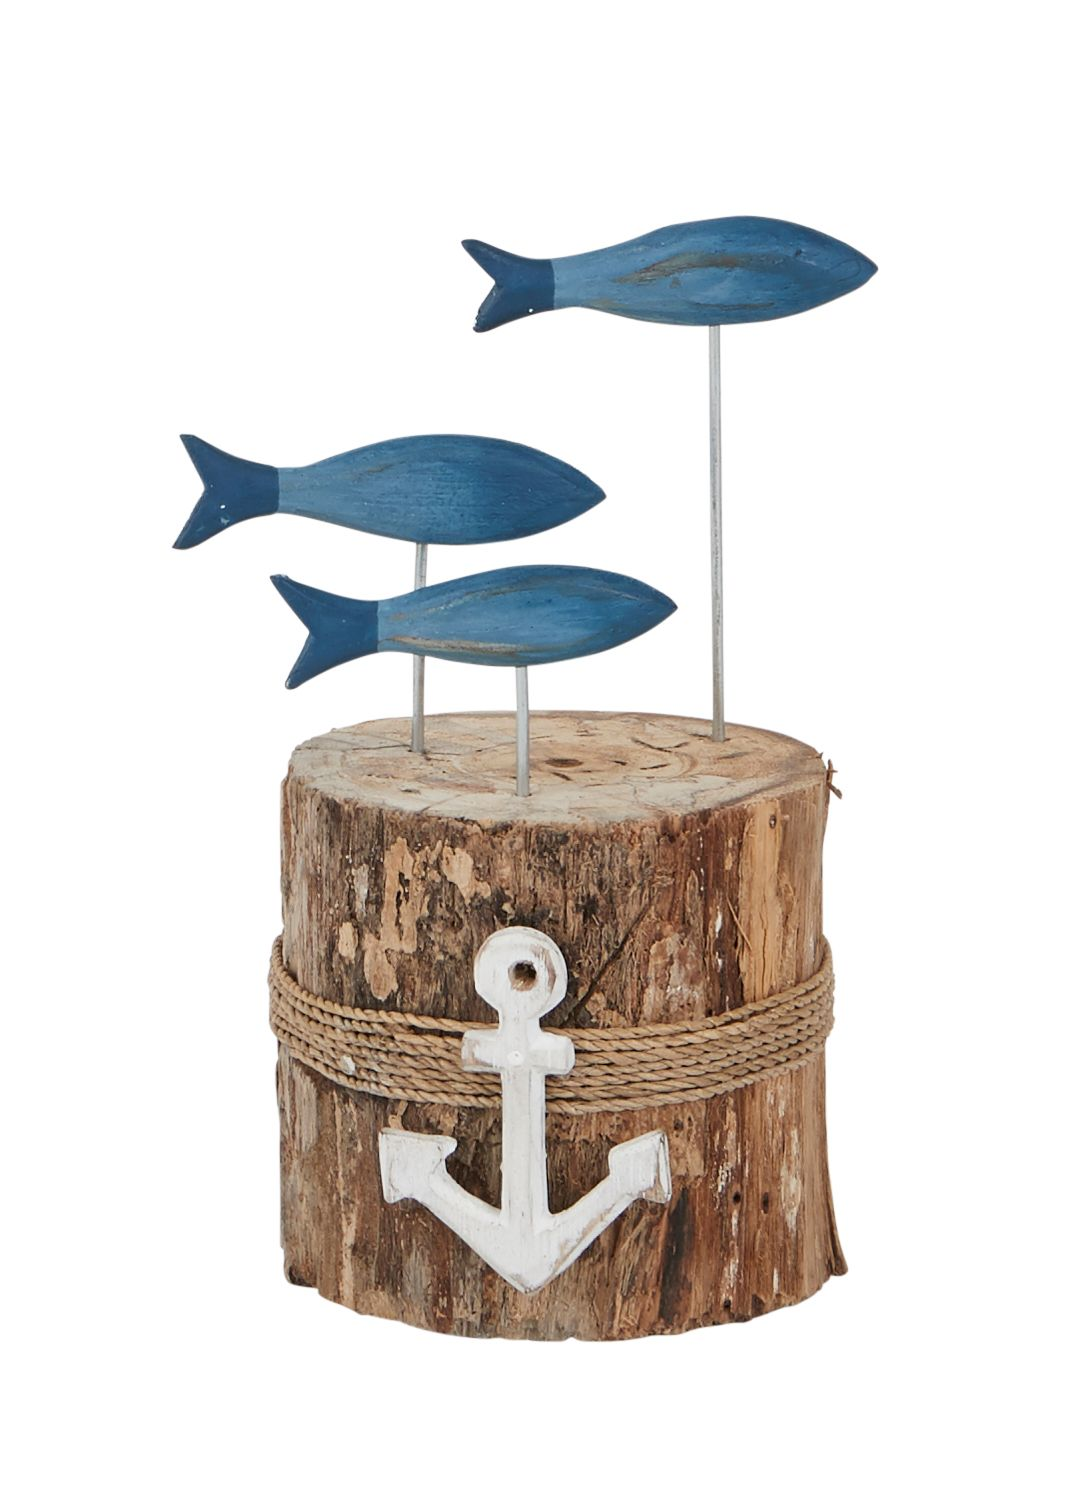 Archipelago Blue Fish Stump Wood Carving Small